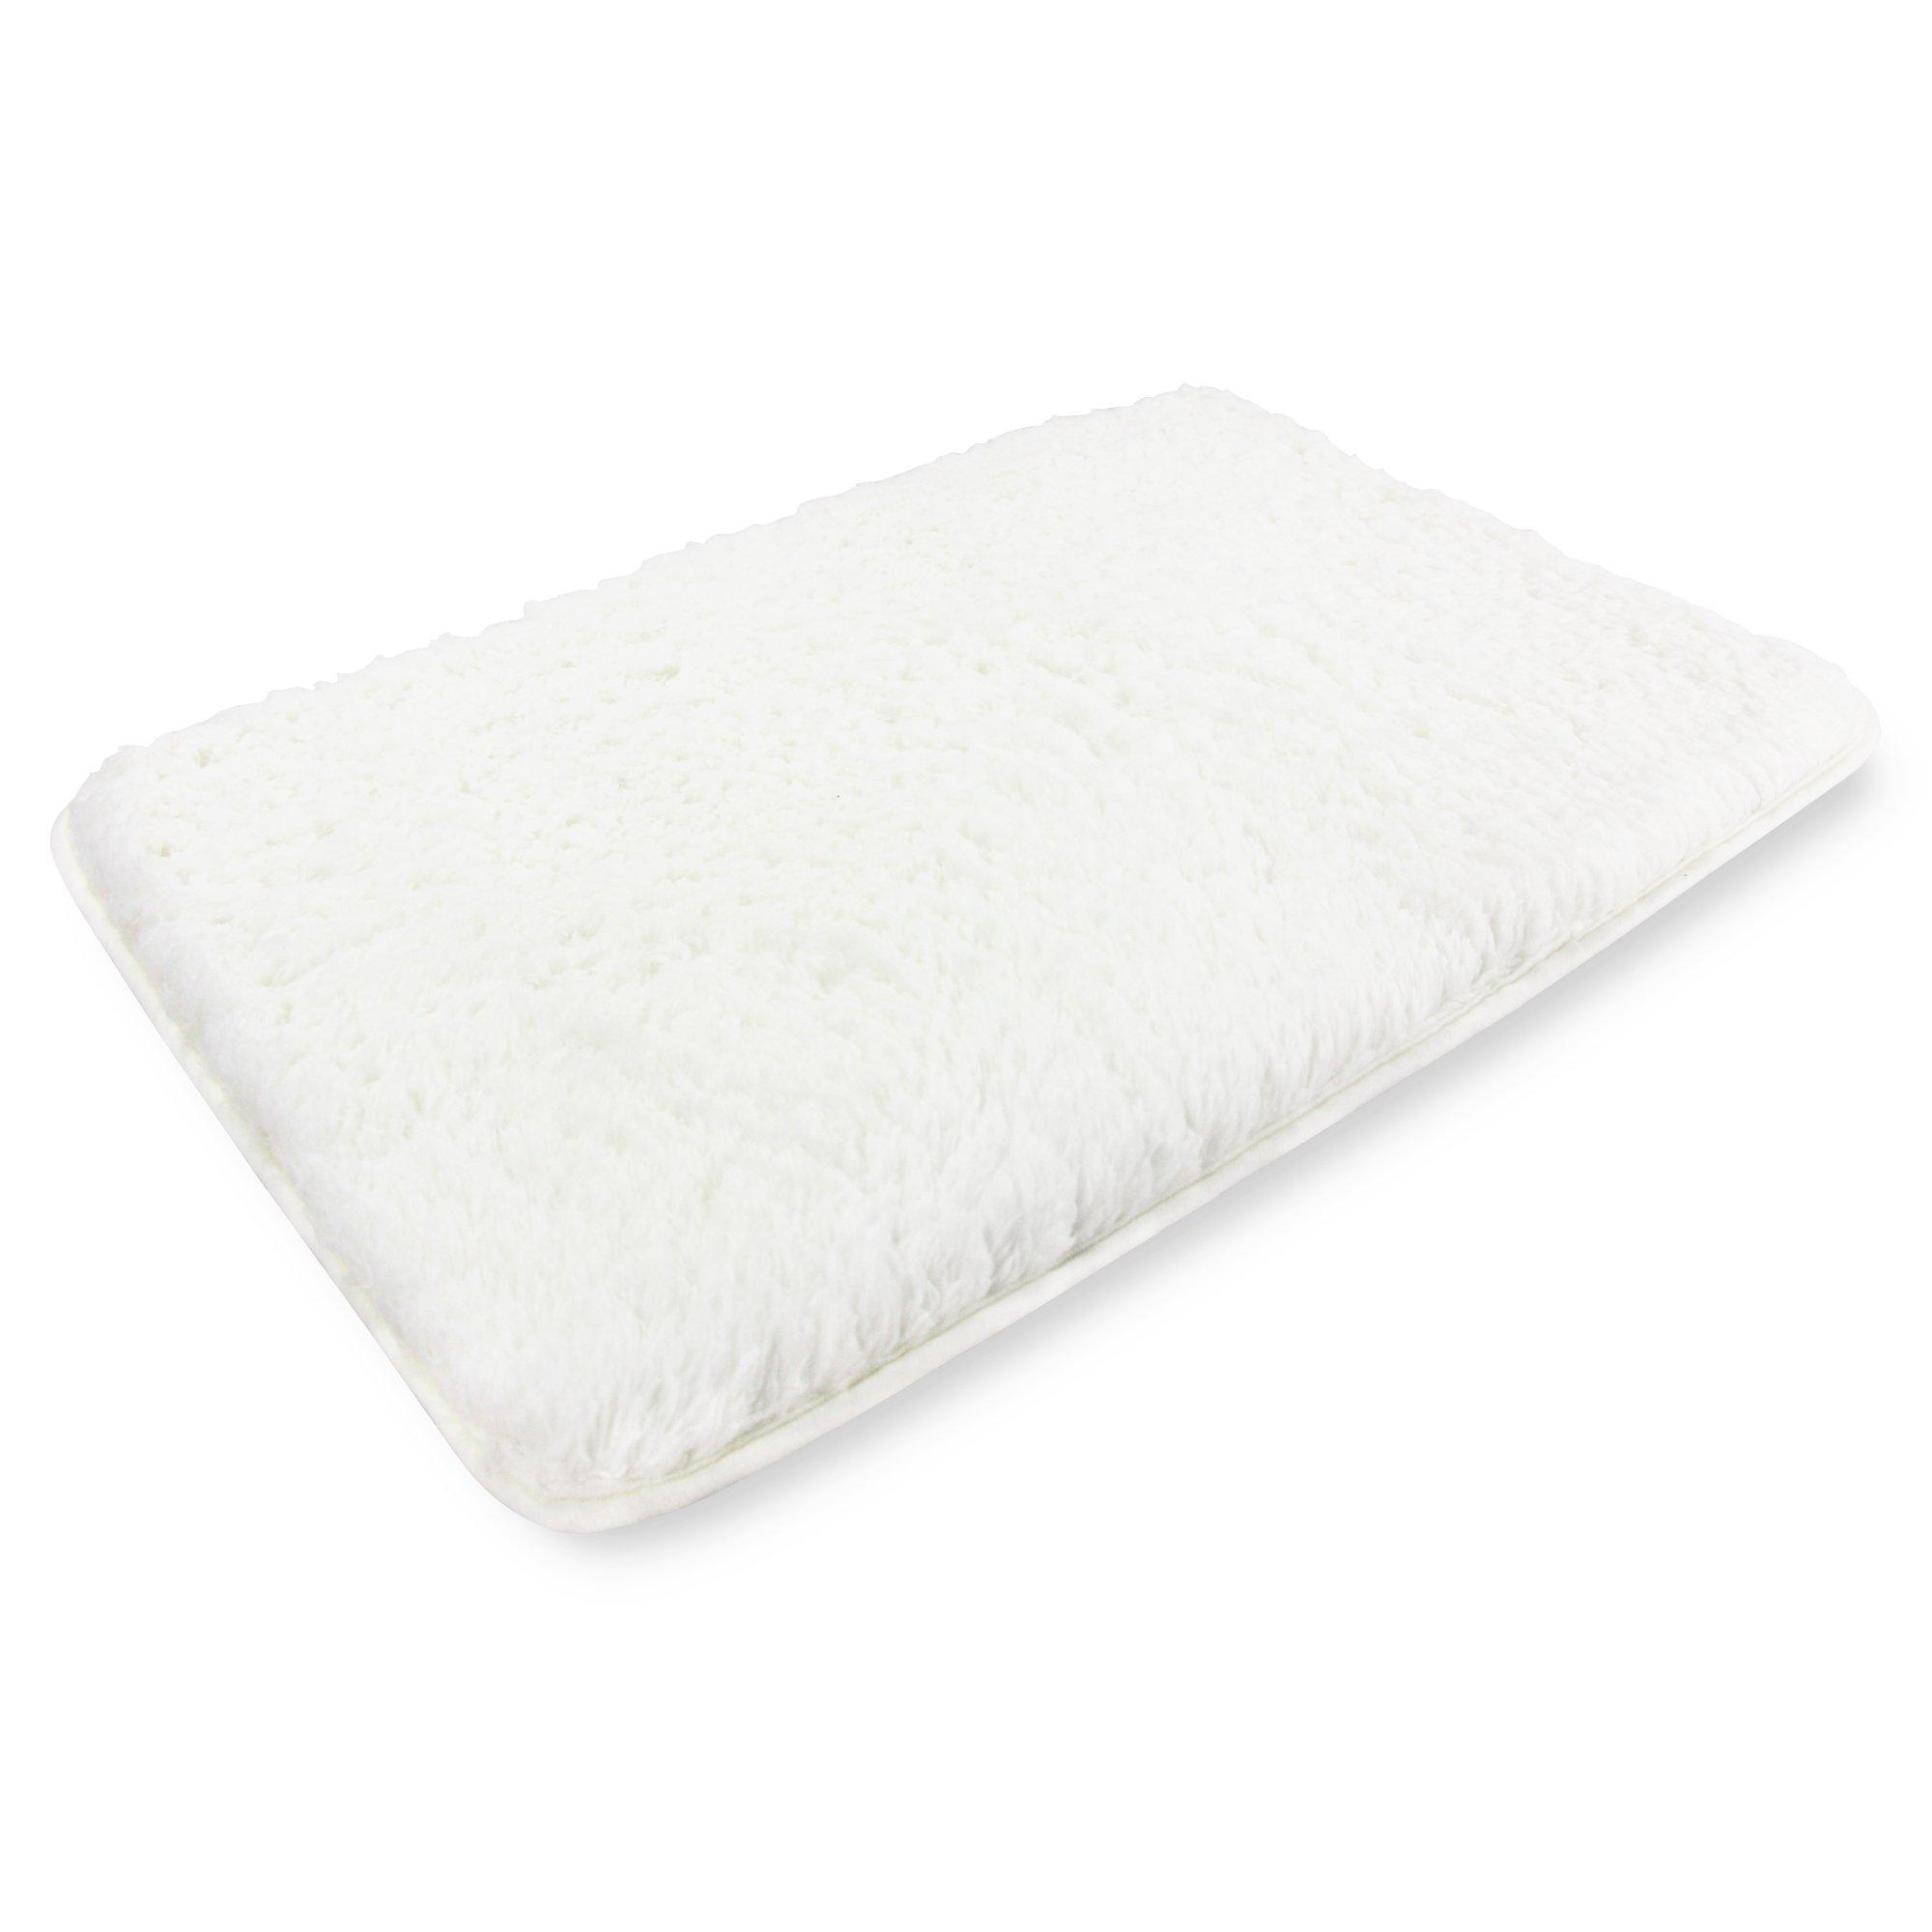 Soft Microfiber Non-Slip Antibacterial Rubber Luxury Bath Mat Rug 20''X32''White